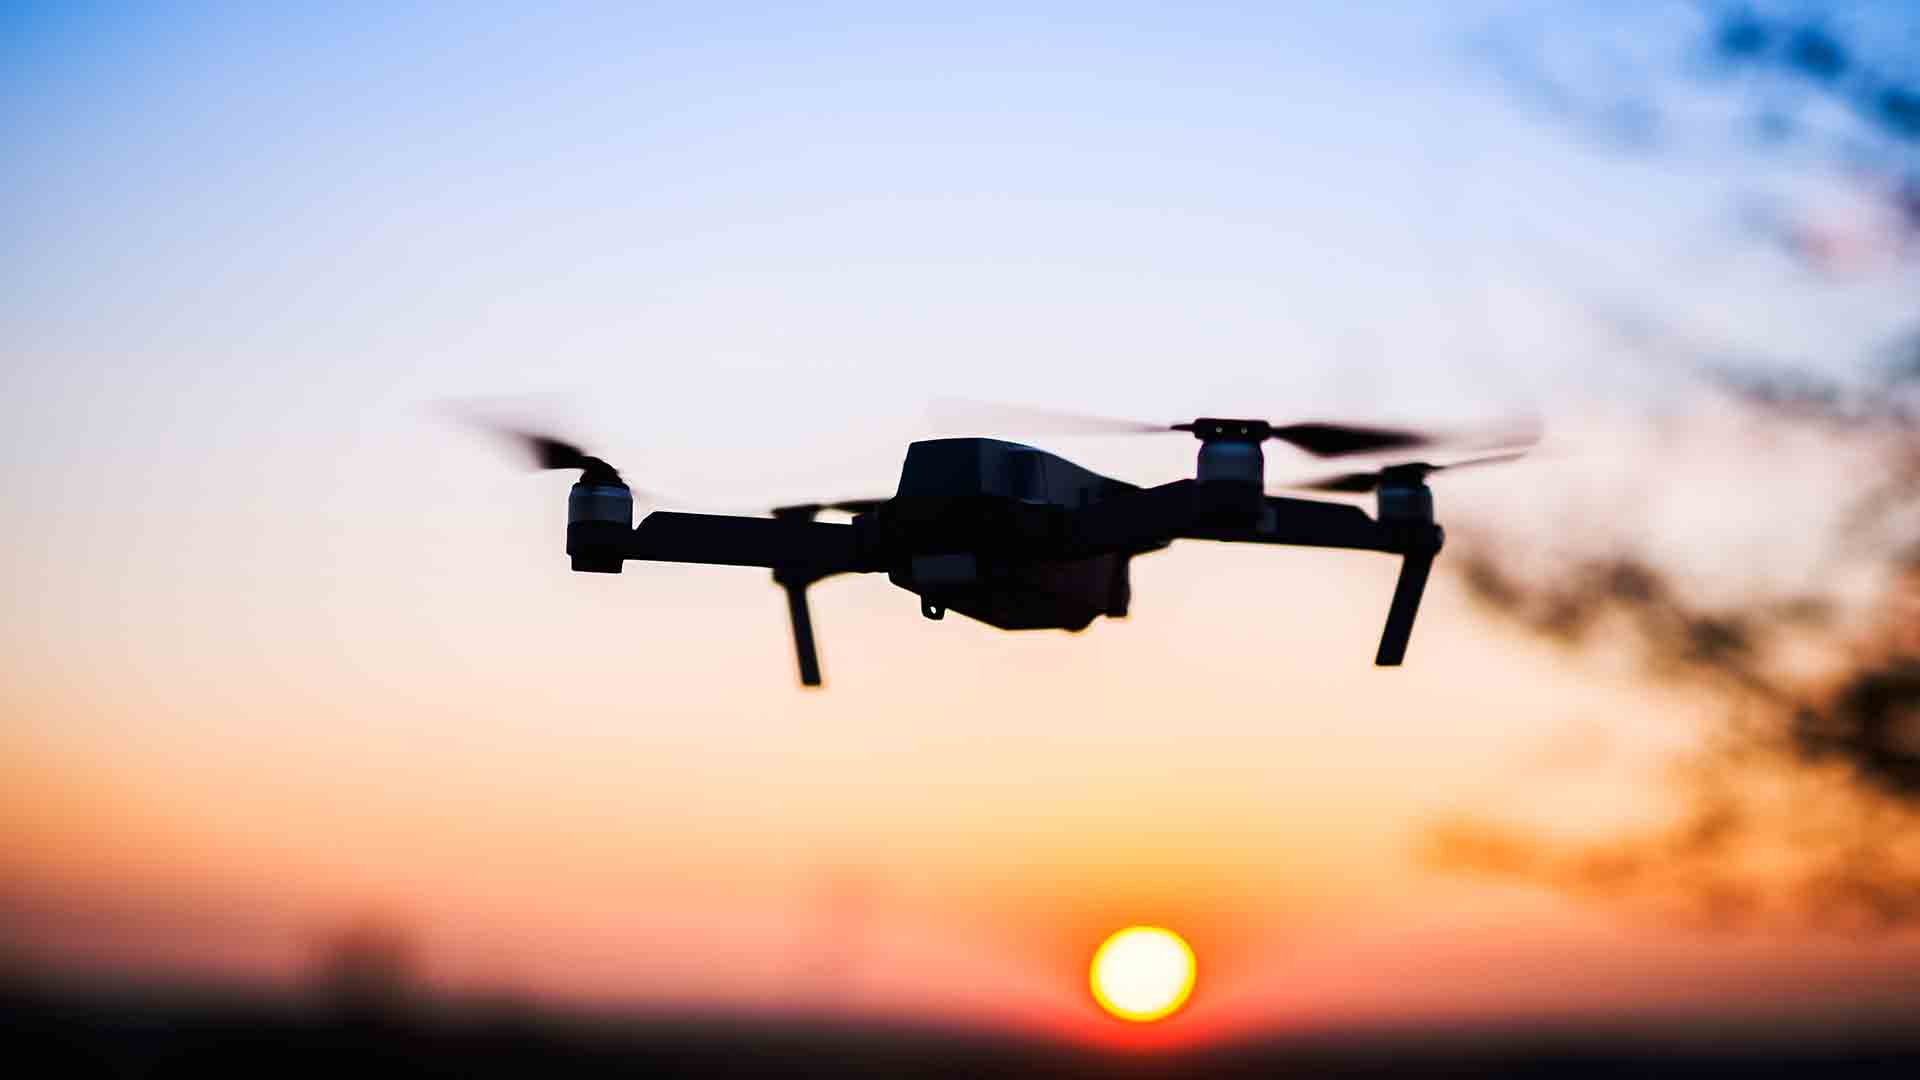 Drone-inspections-las-vegas-nv-1920px-1080px.jpg